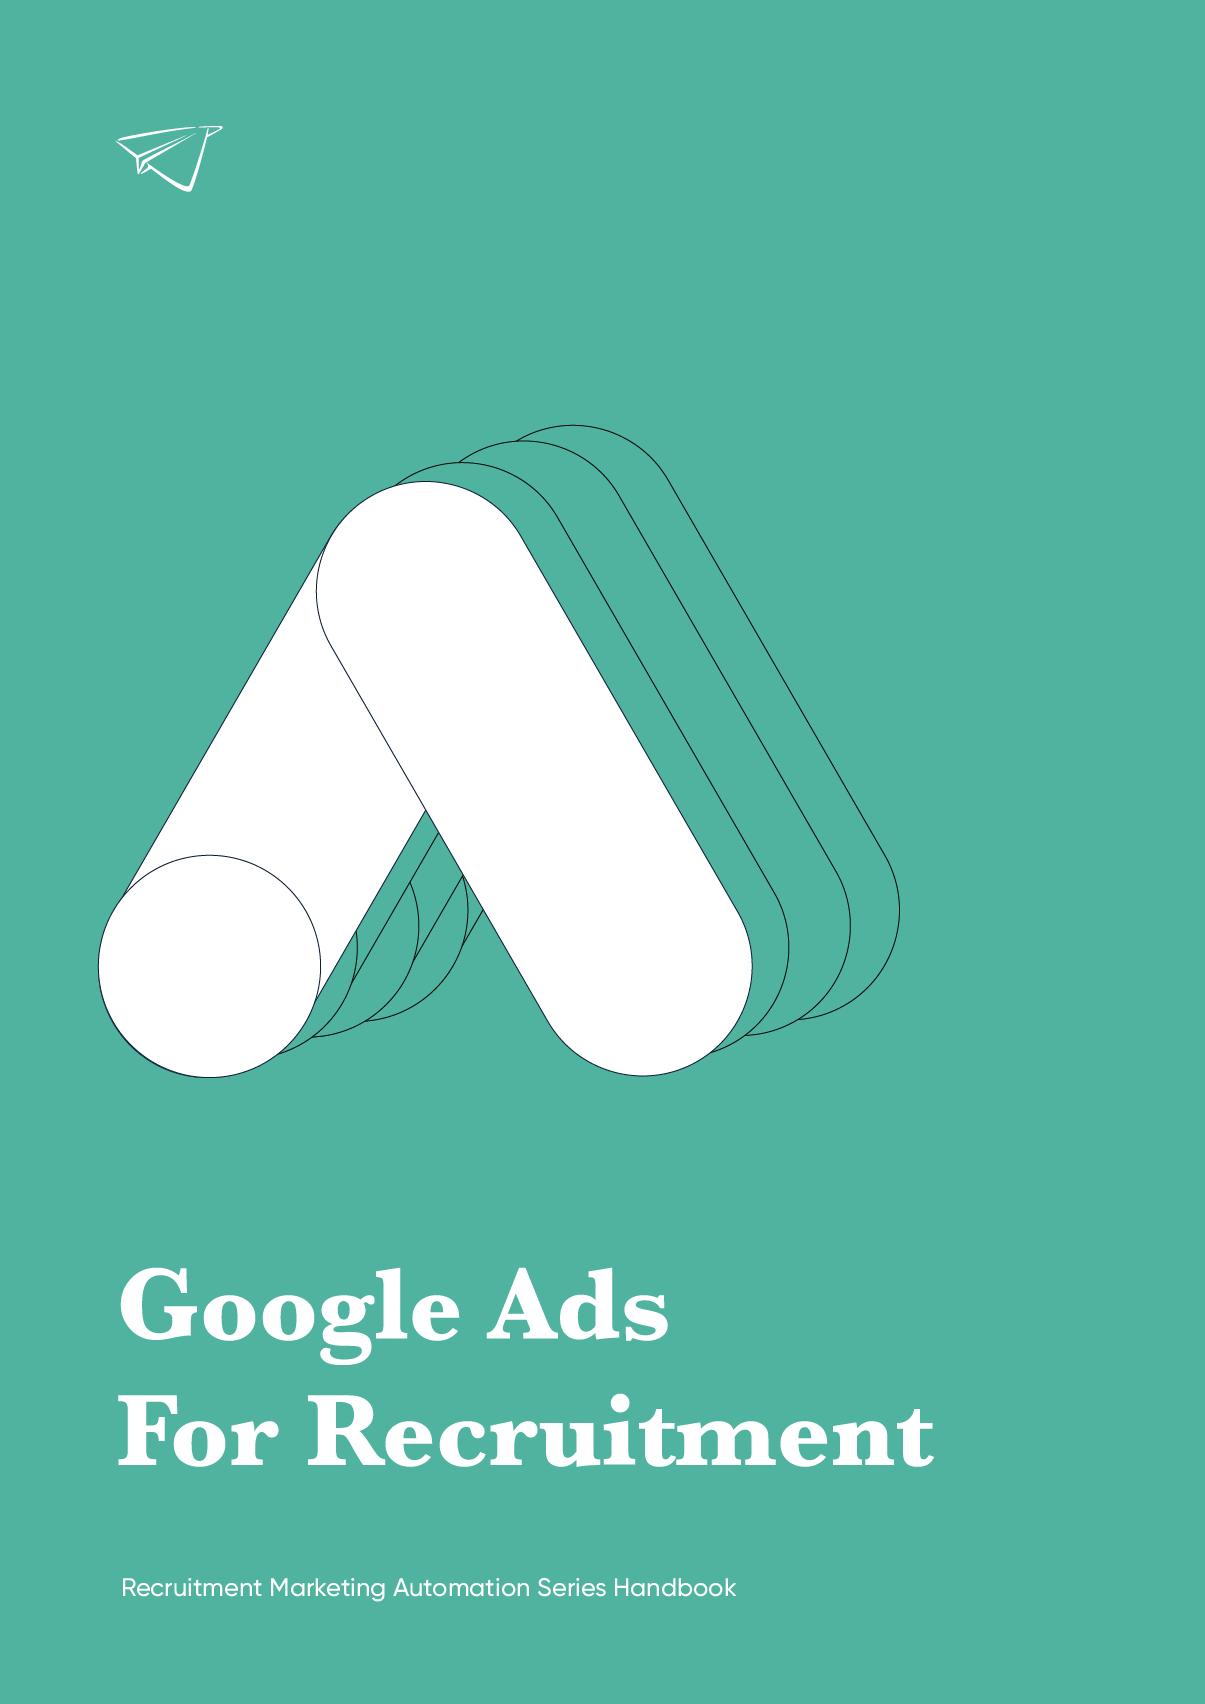 Google Ads for recruitment-8